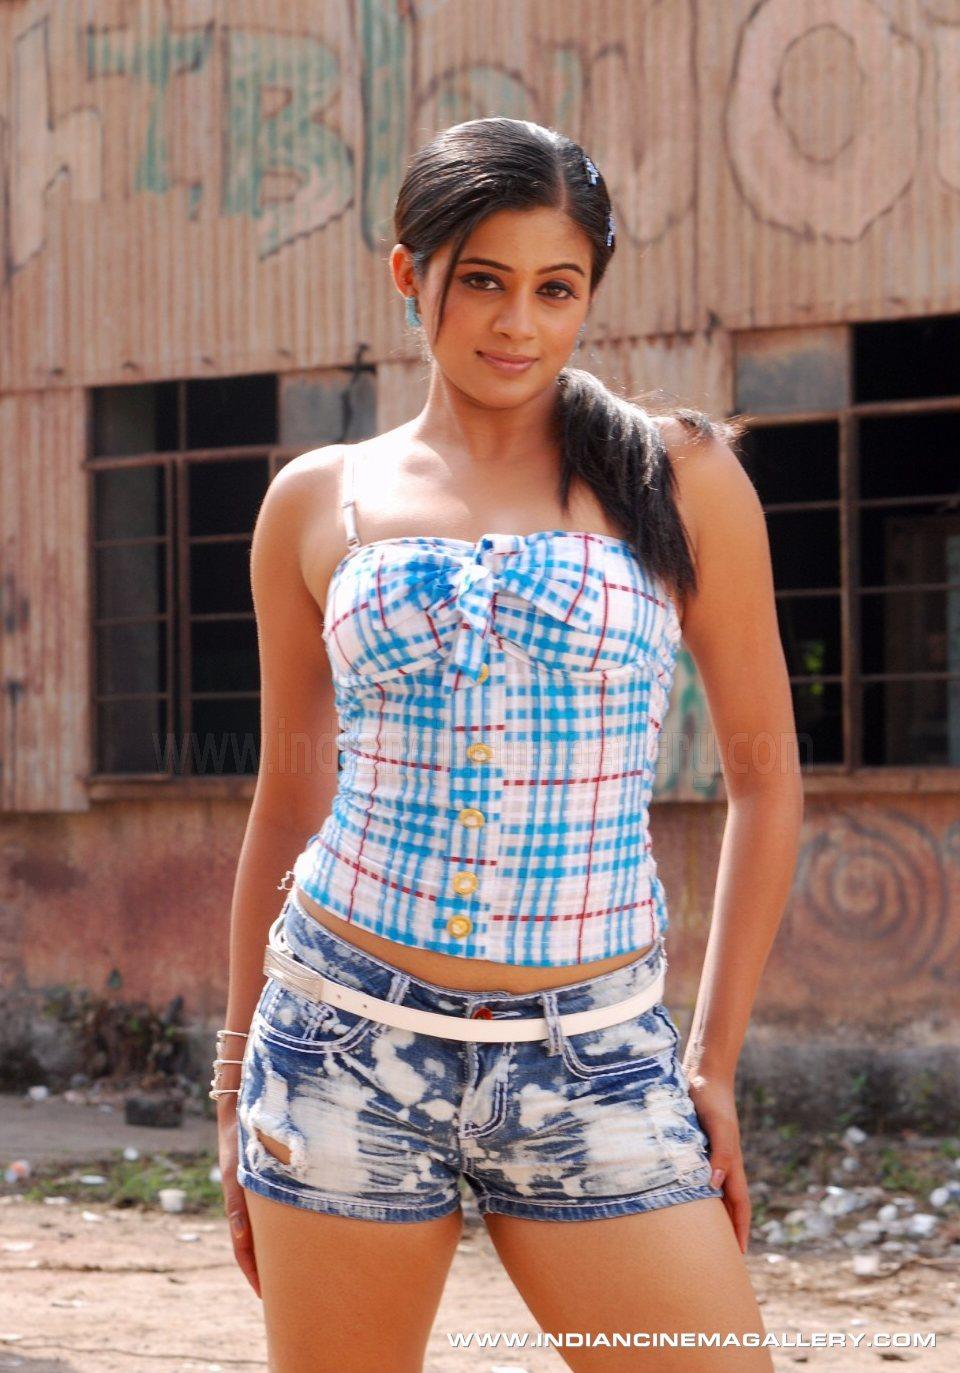 Indian Cinema Gallery South Actress Priyamani Photos -4966